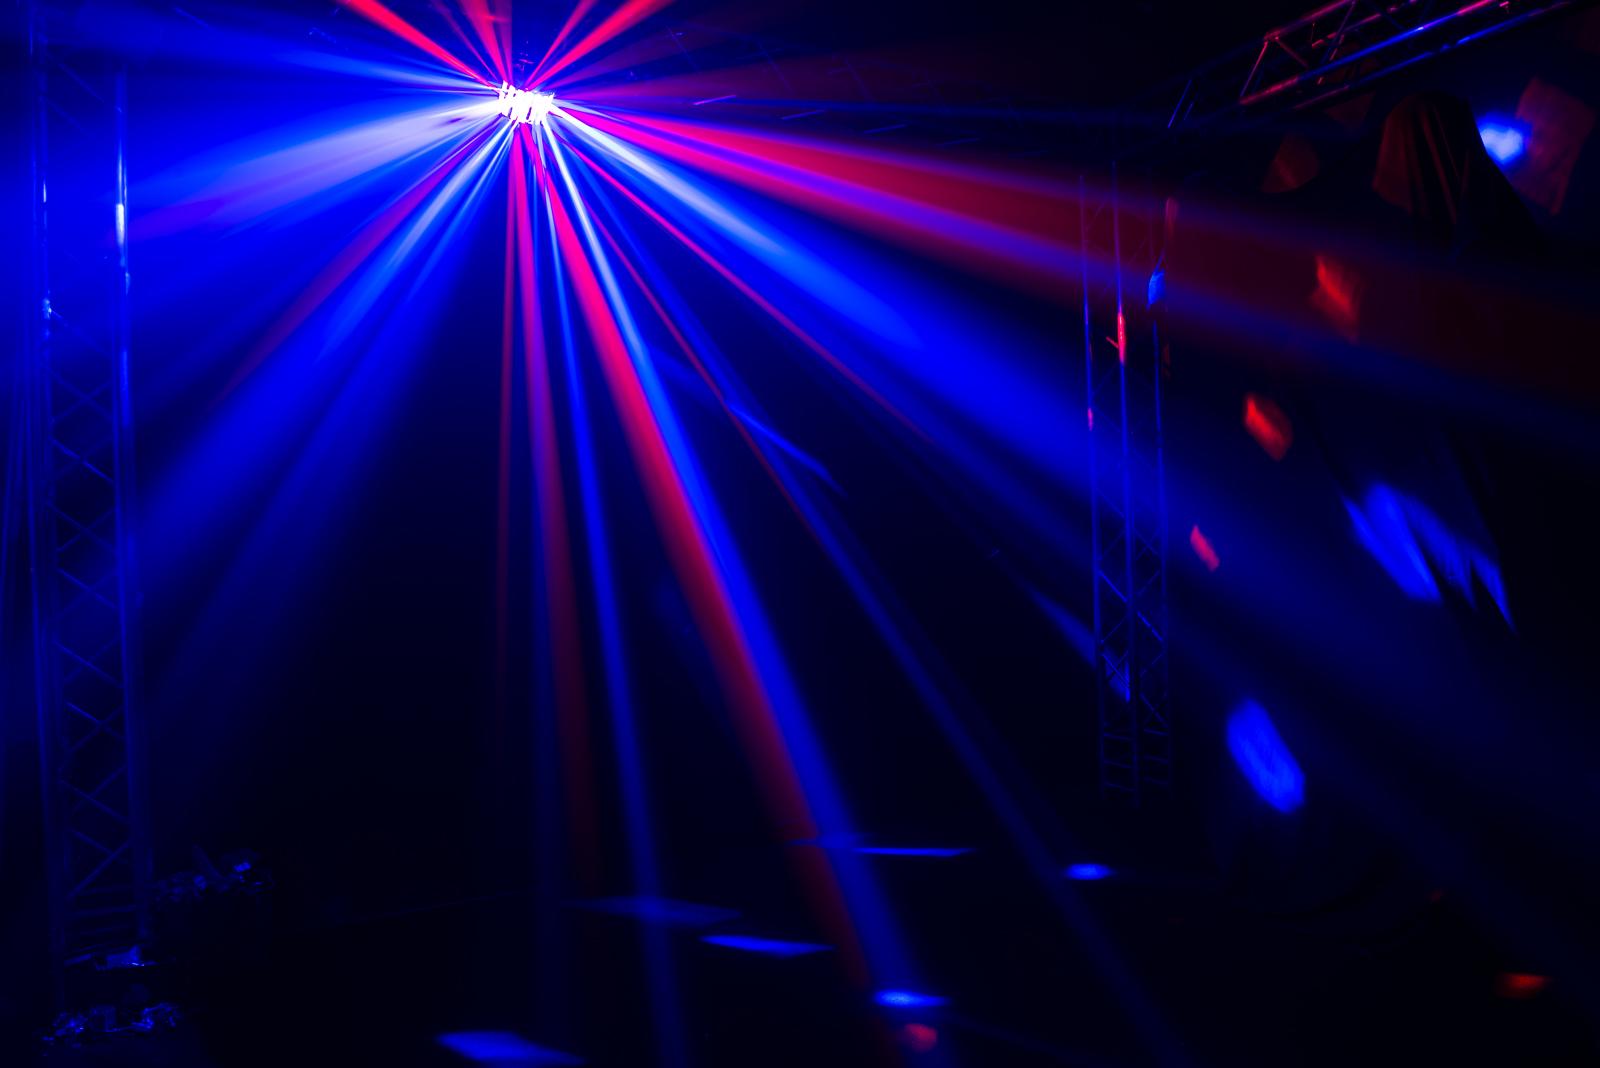 100 Dj Beam Effect Laser Light 7ch Dmx 6 Heads Rgb